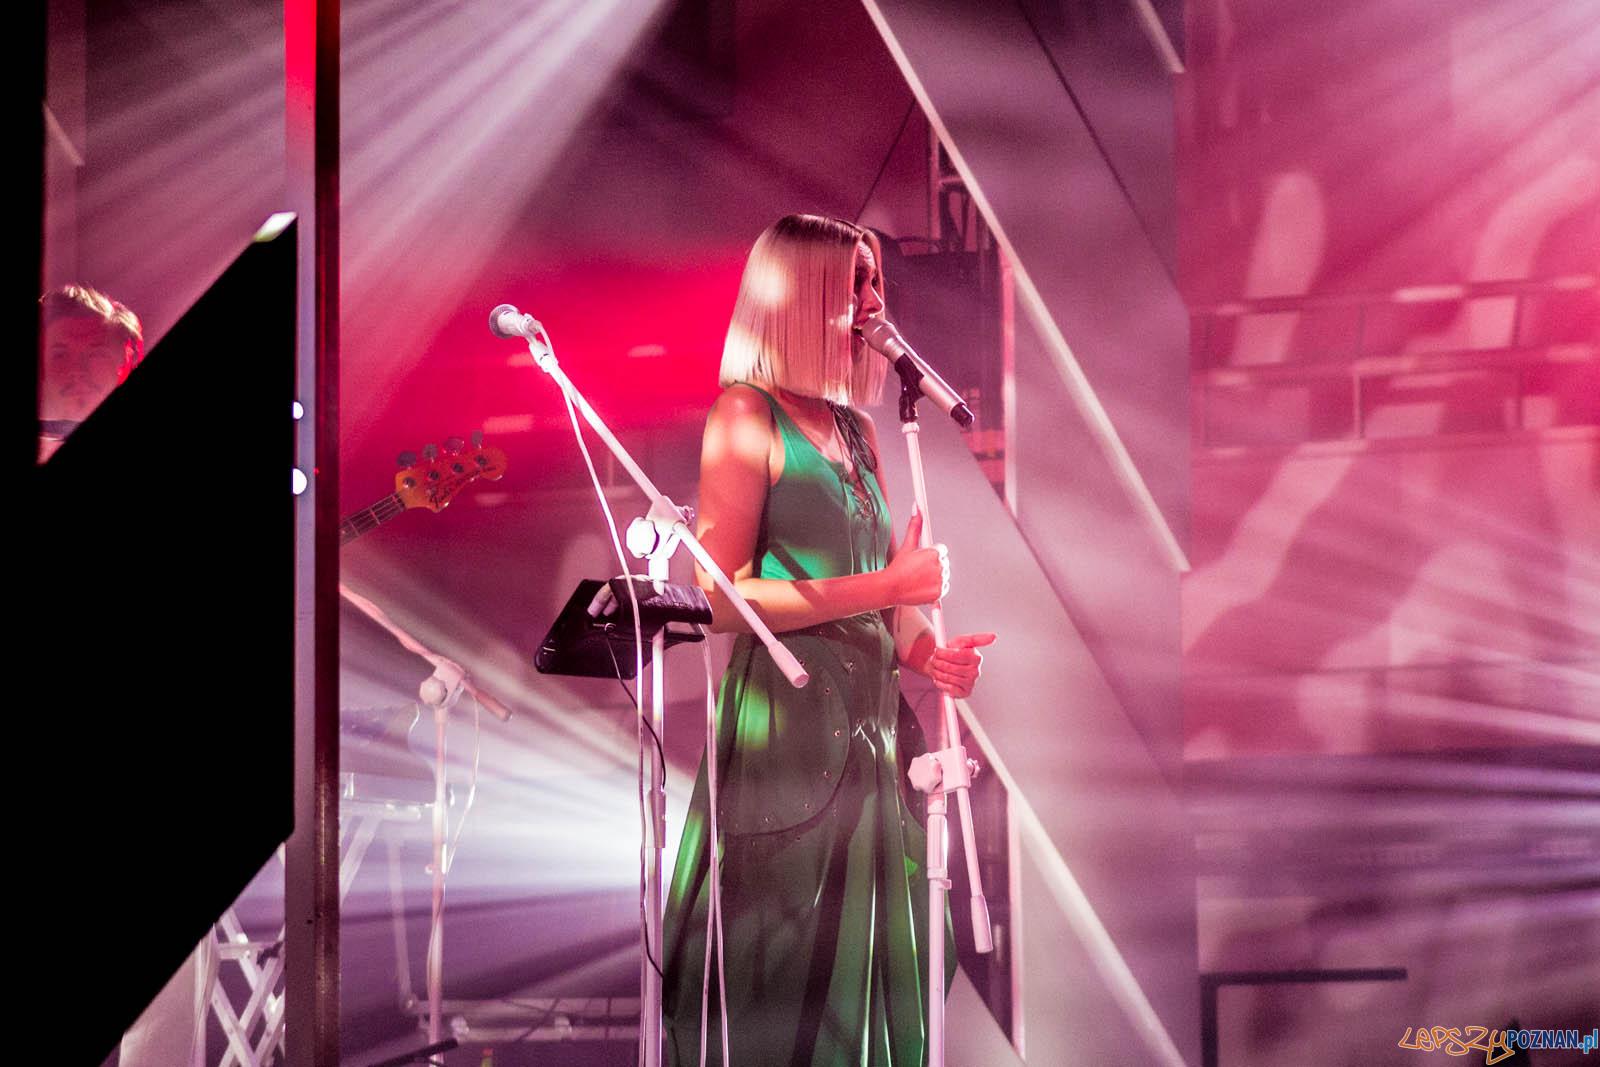 Natalia Nykile - Total Tour  Foto: lepszyPOZNAN.pl / Ewelina Jaskowiak